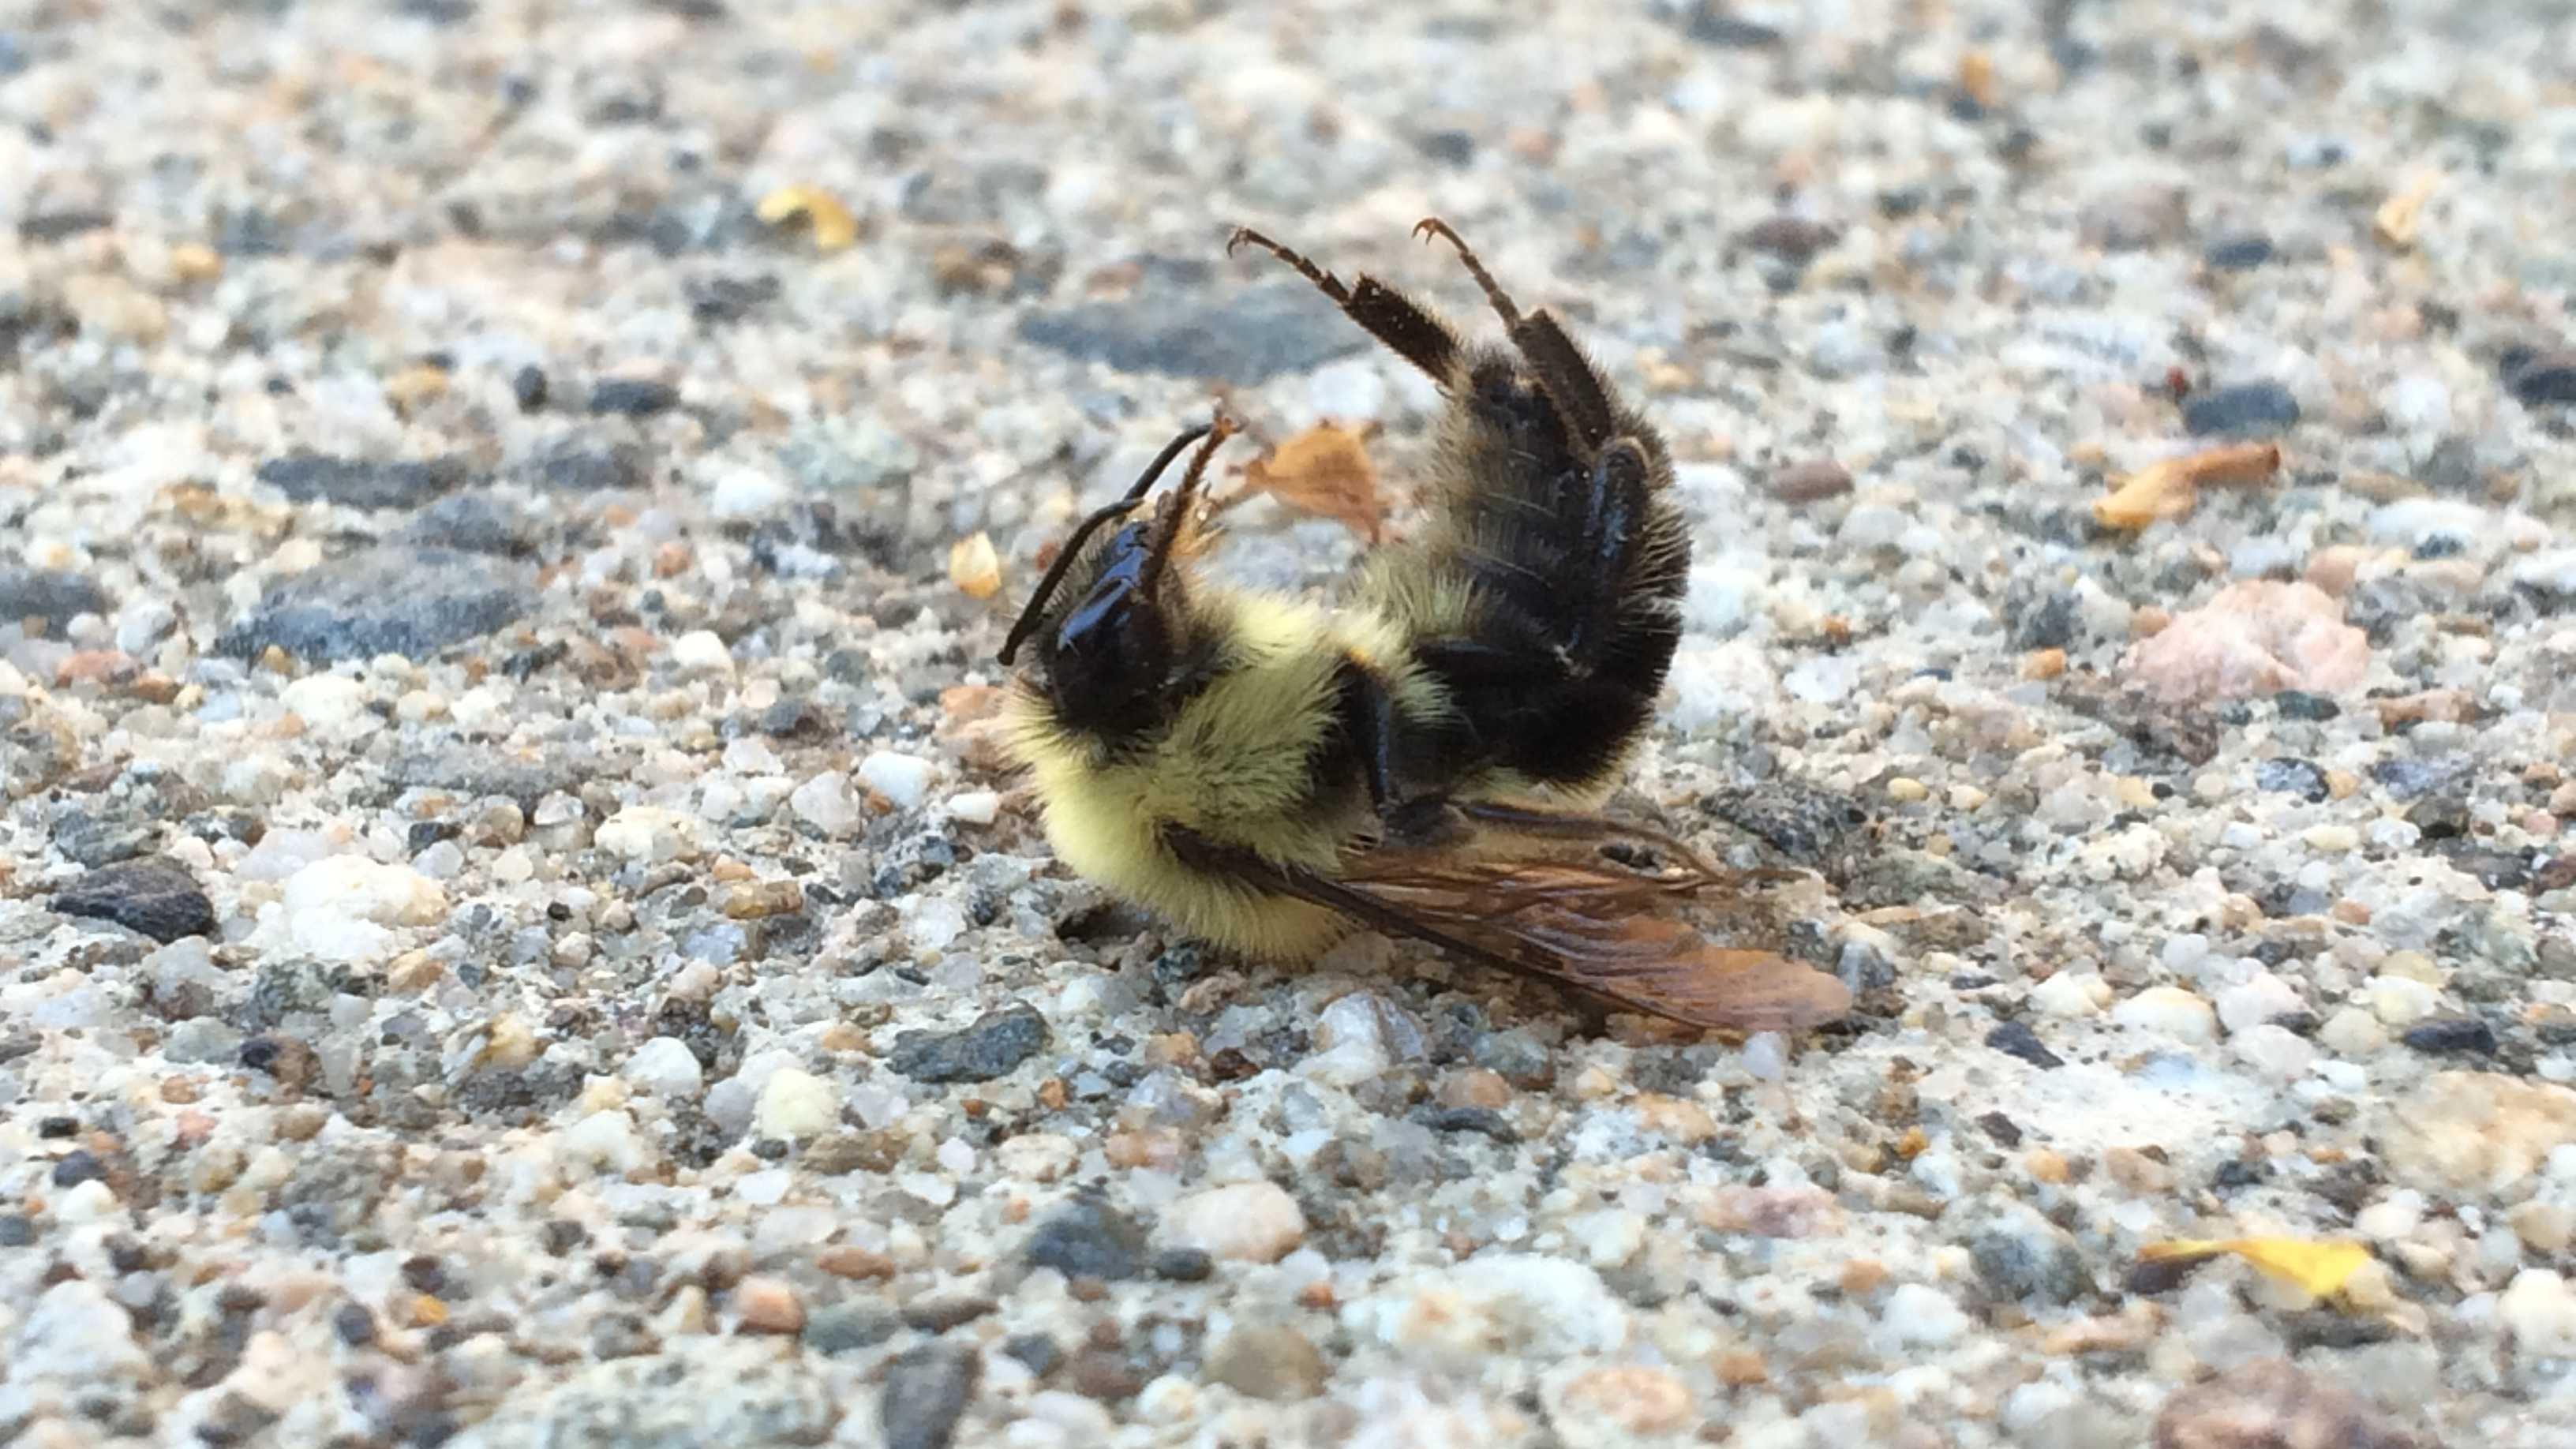 Bees killed 0709.jpg